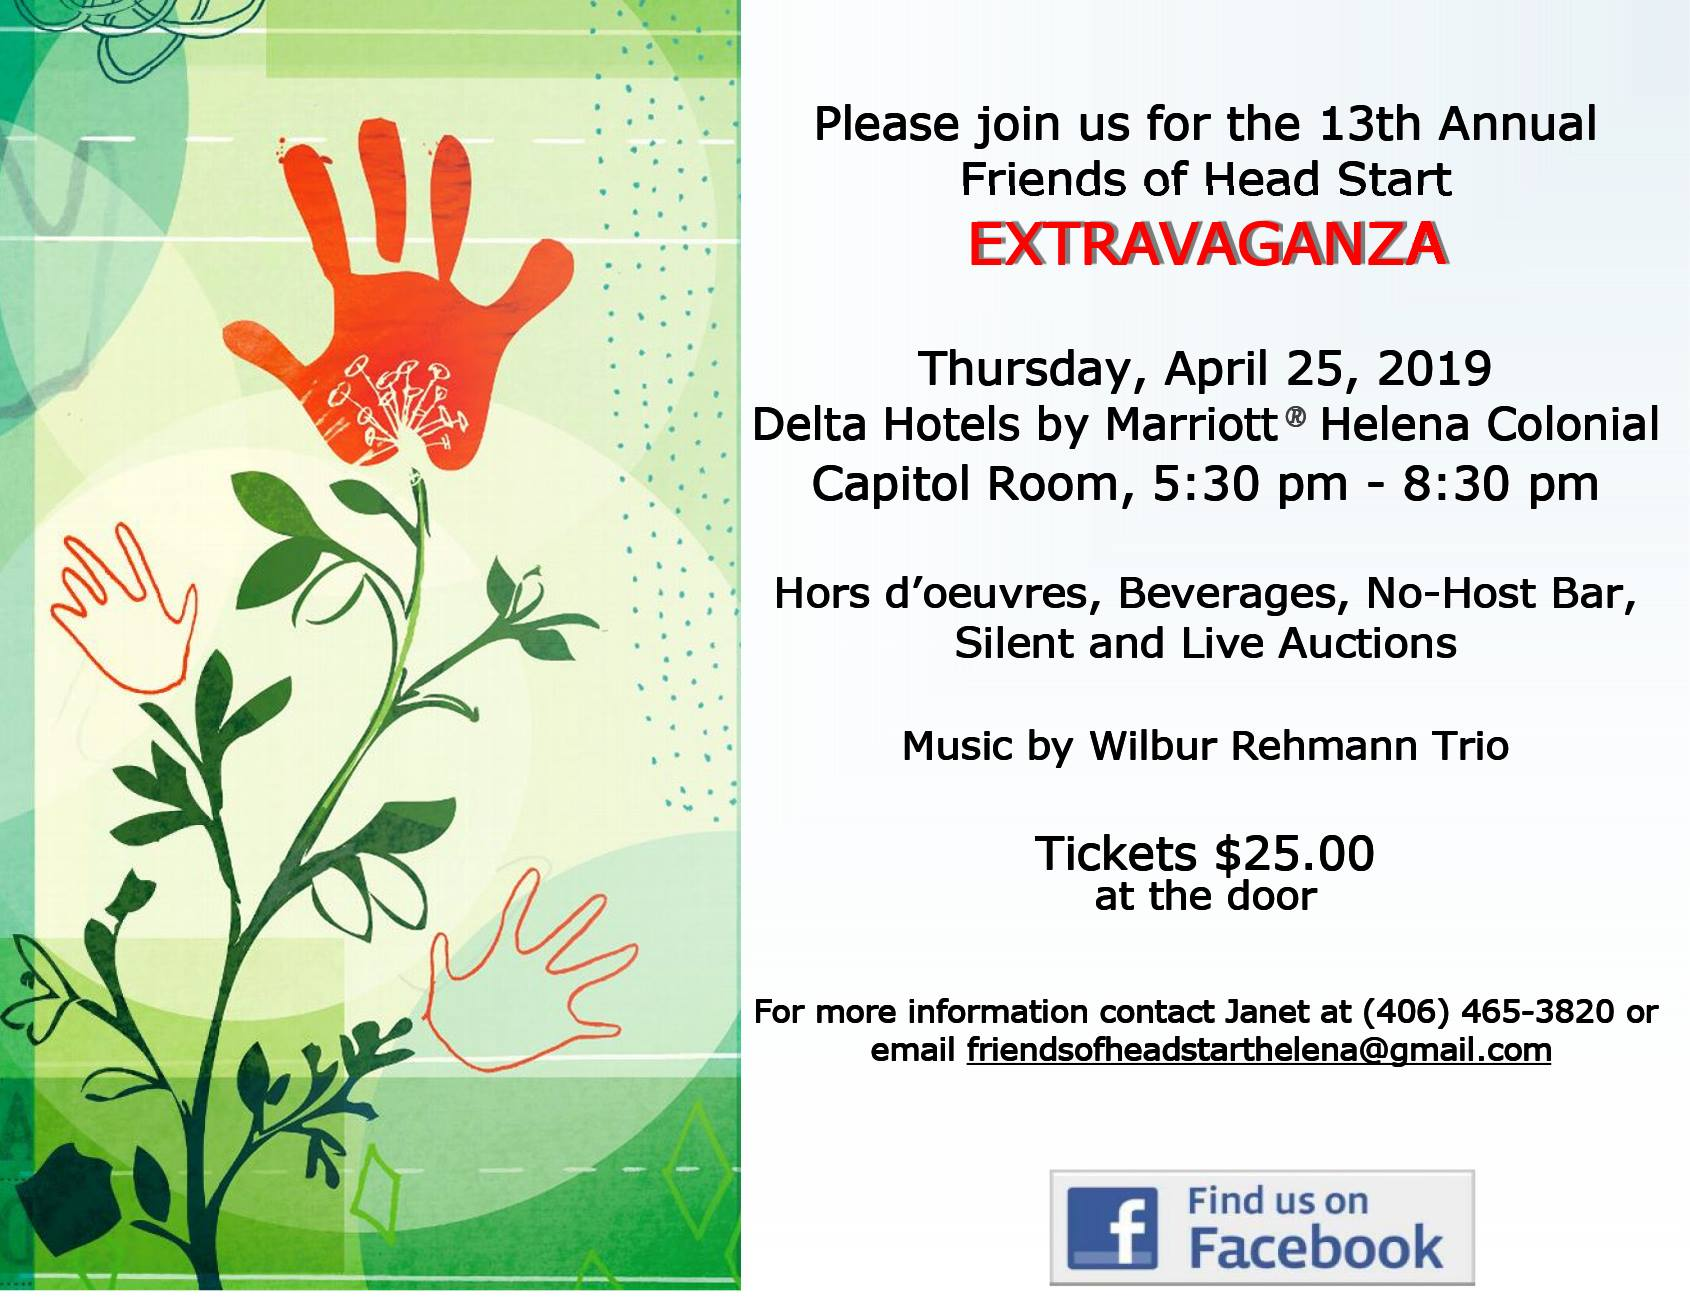 Friends of Head Start Extravaganza invitation image